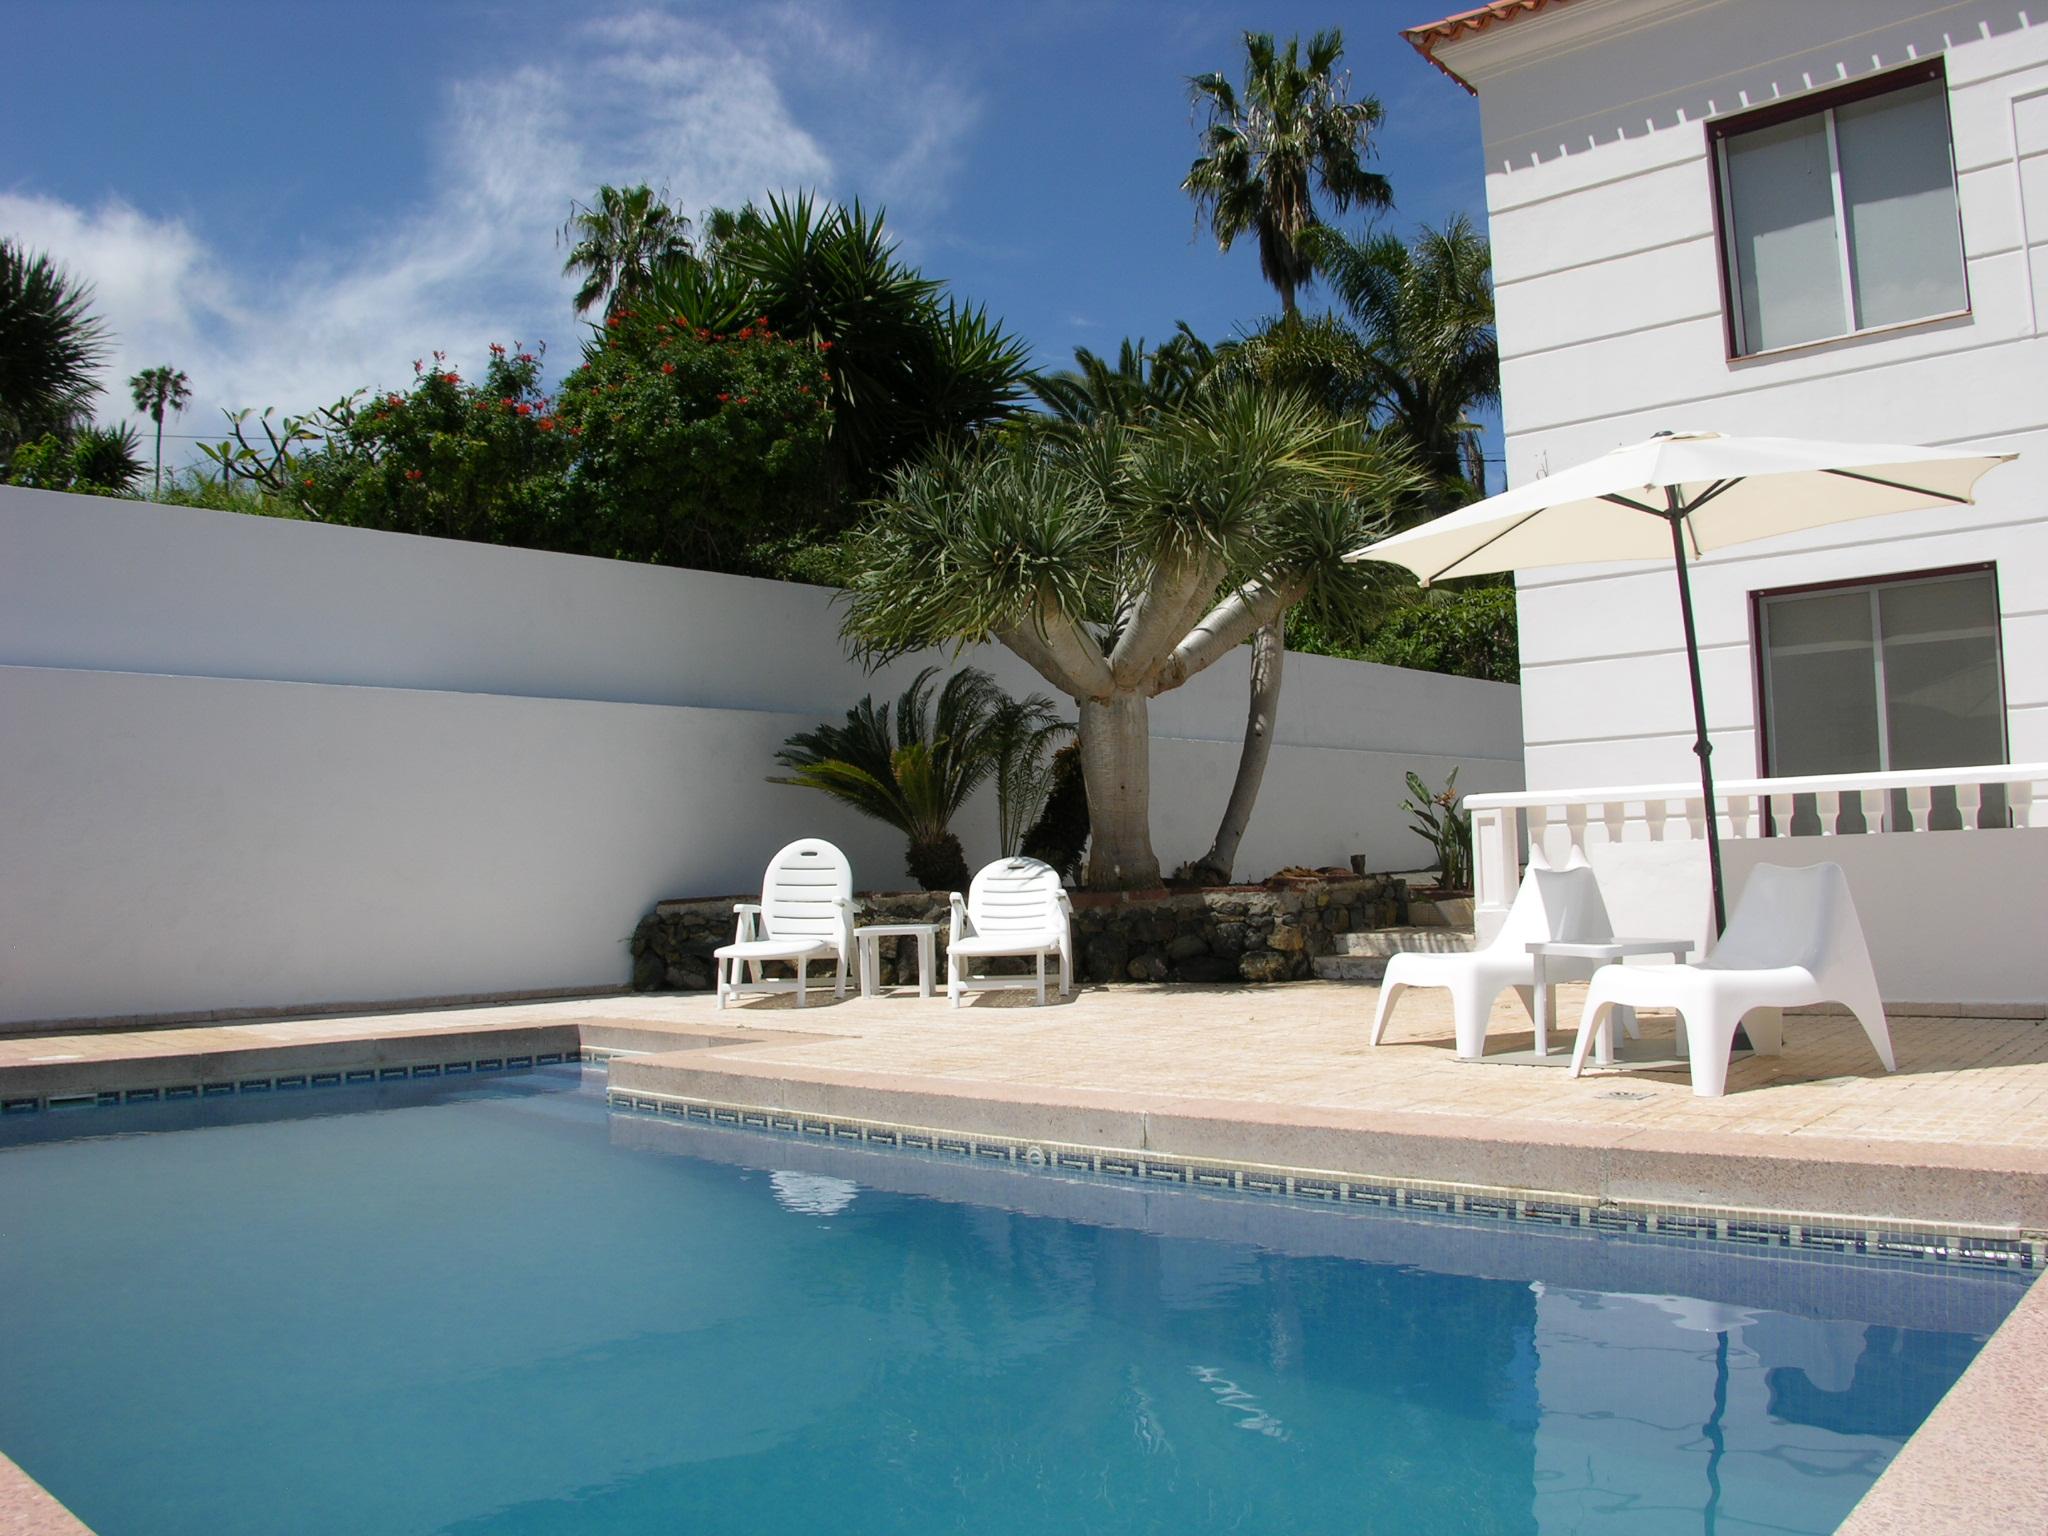 Maison de vacances Villa Vista La Quinta beheizbarer Pool kostenloses WLAN Grill (2124407), Santa Ursula, Ténérife, Iles Canaries, Espagne, image 41